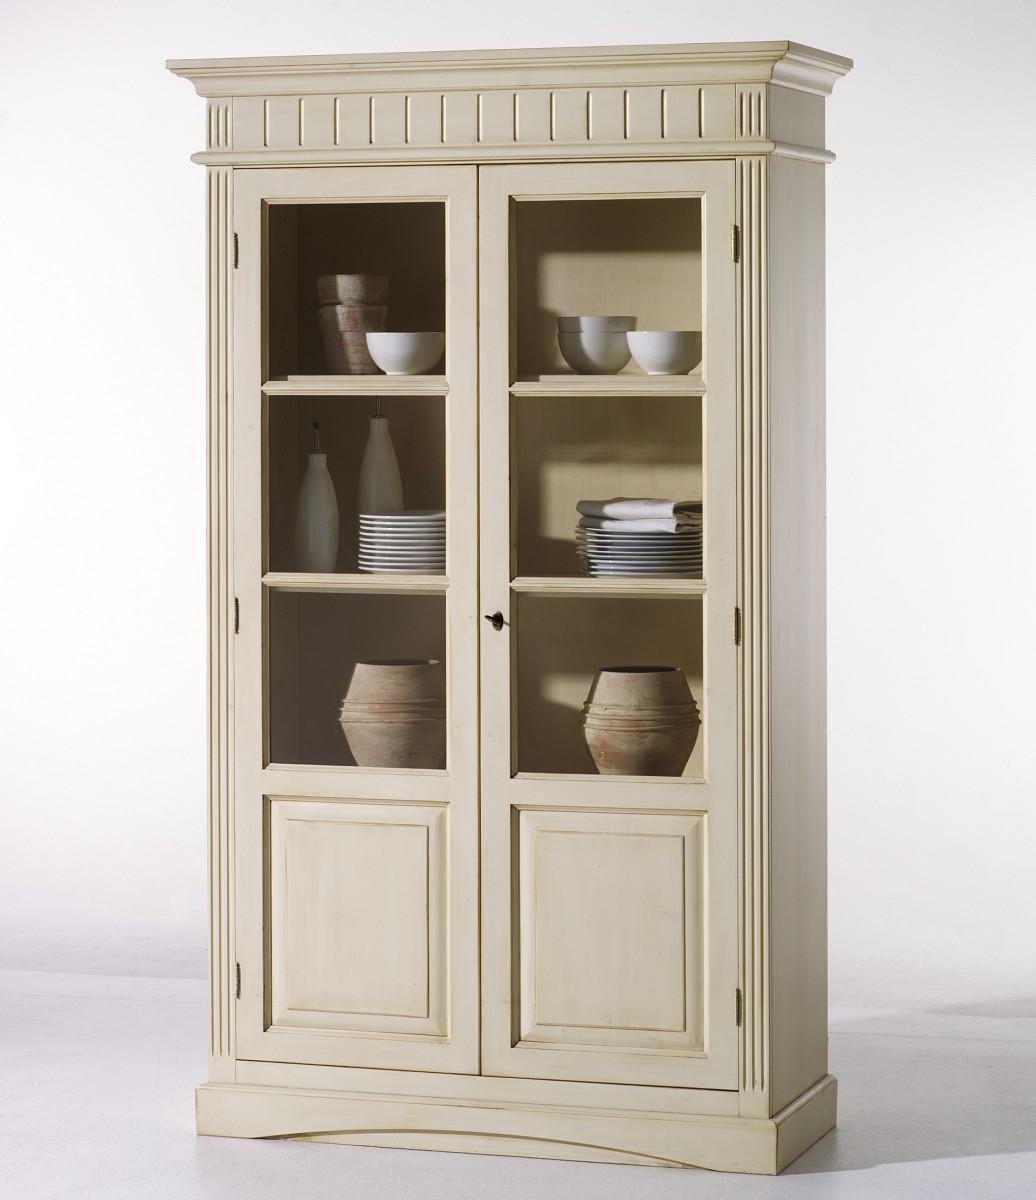 vitrine vitrinenschrank fichte massiv klassisch elegant. Black Bedroom Furniture Sets. Home Design Ideas